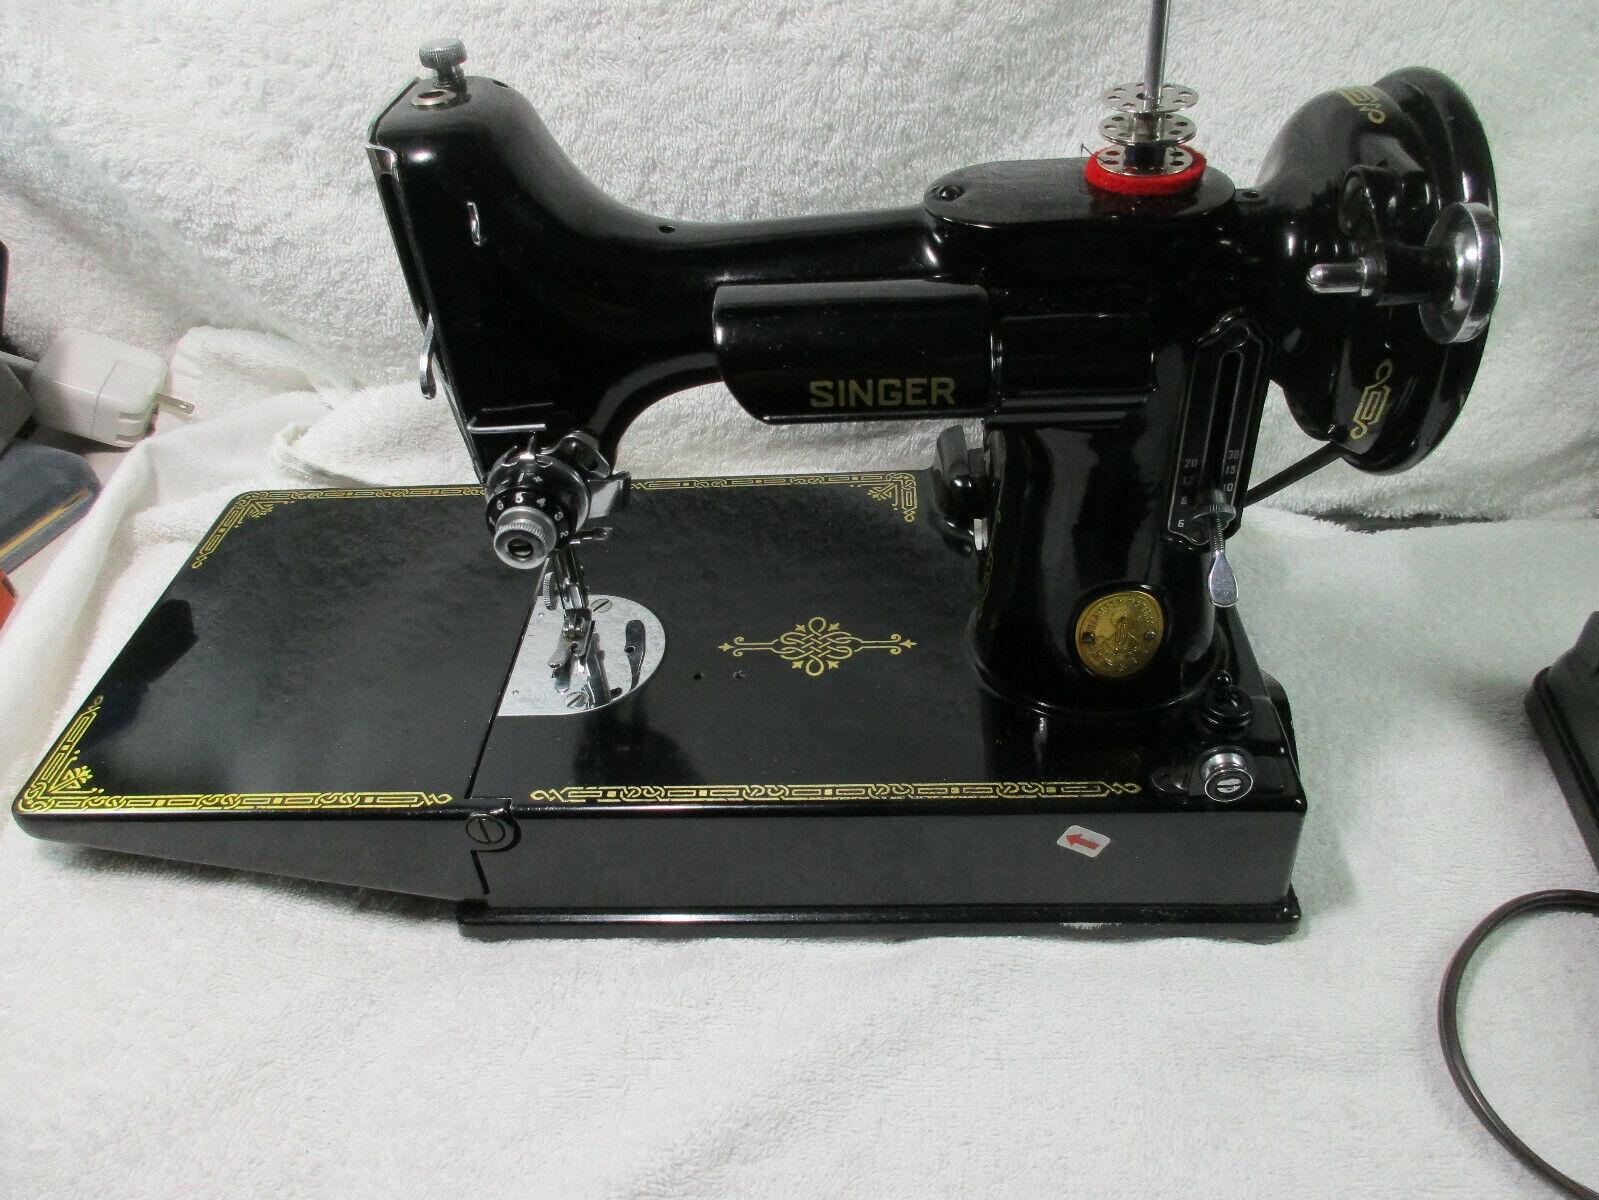 Domestic Home Sewing Machine Motor /& Pedal Singer HA1 15 66 99K#34